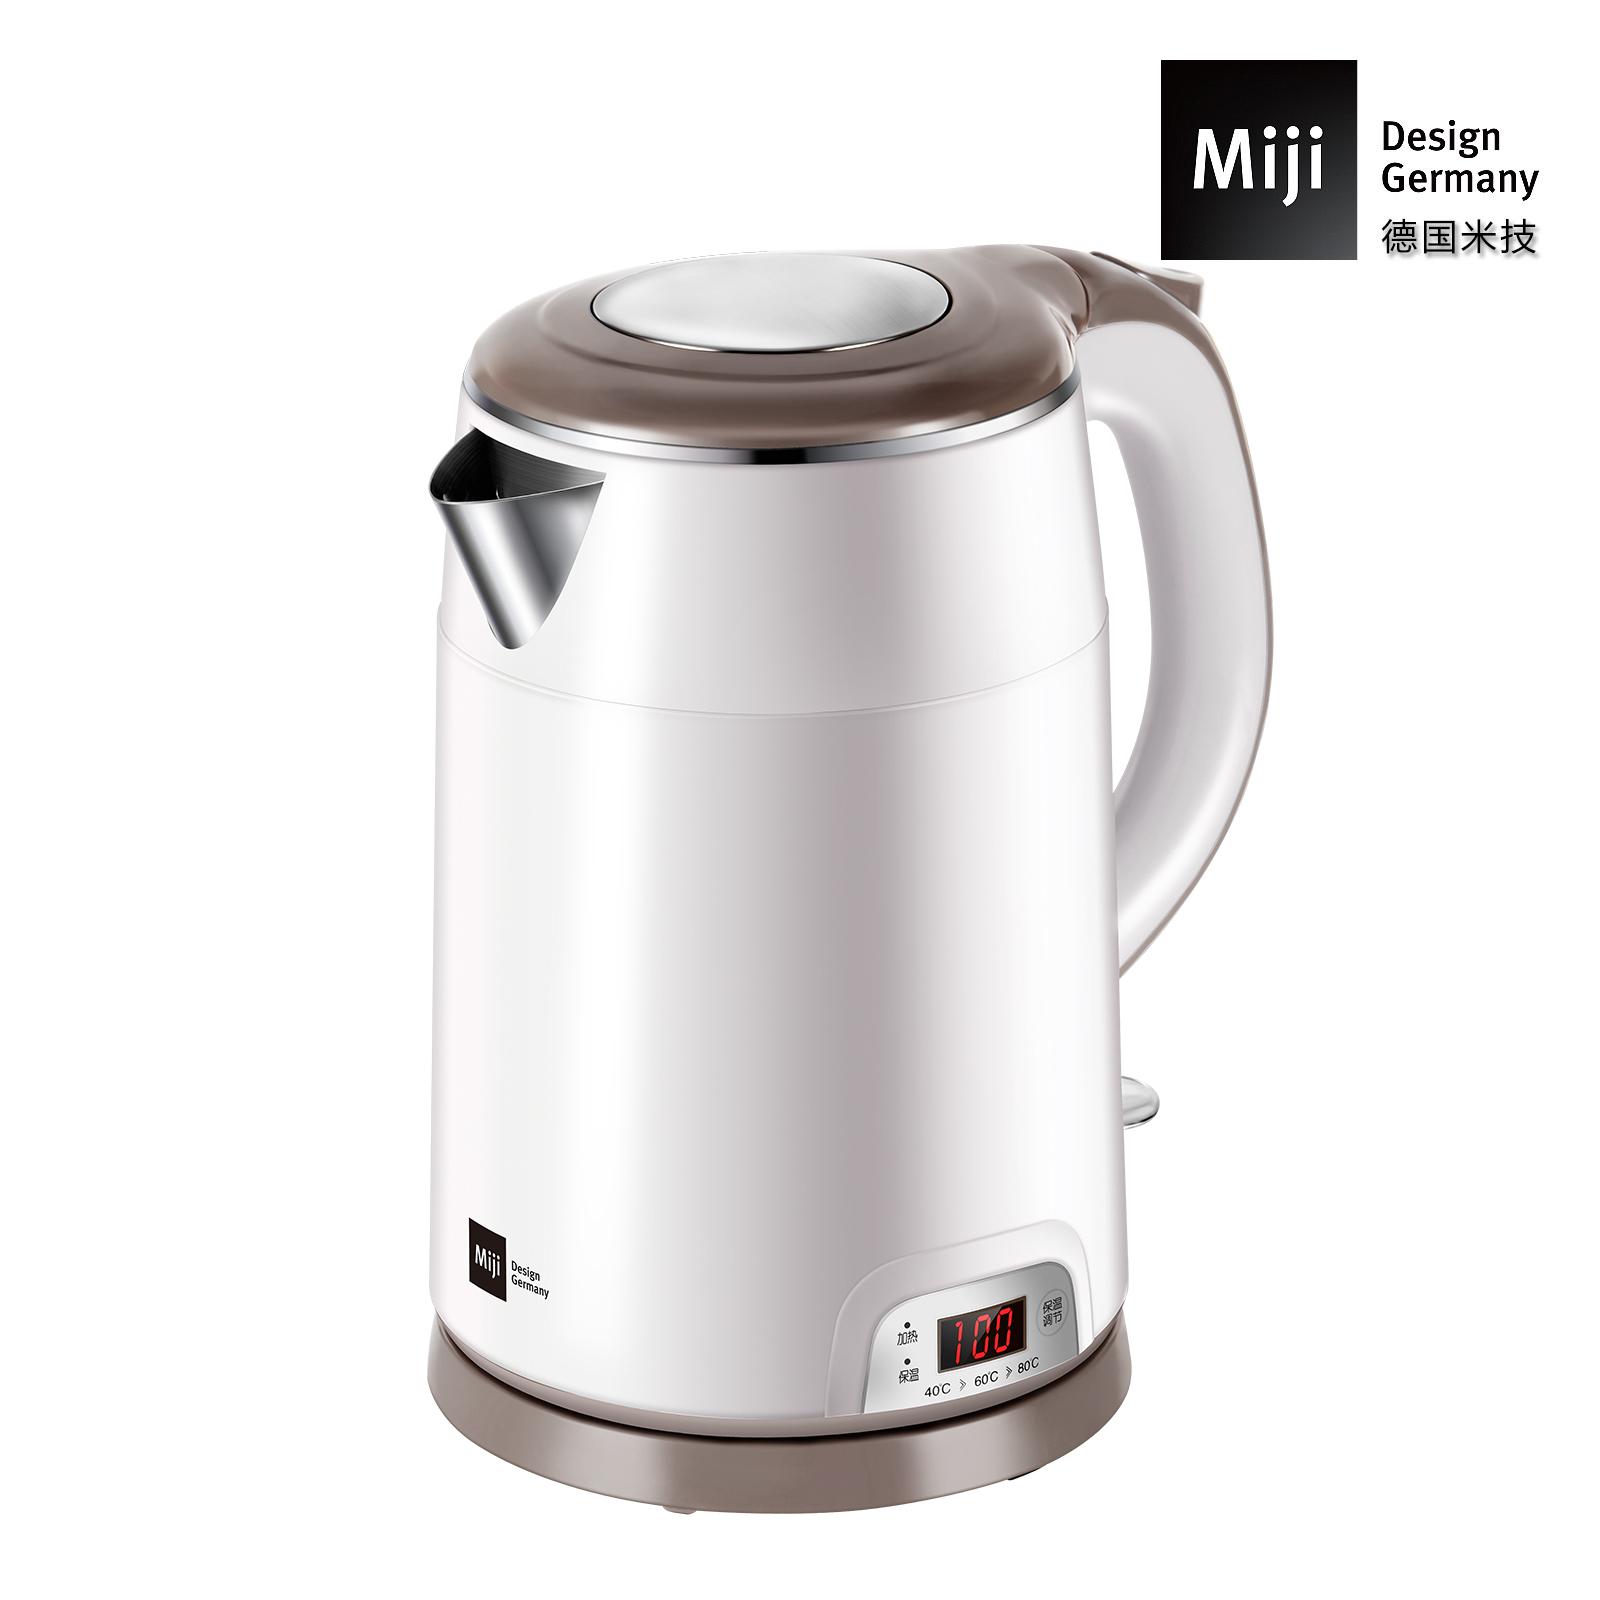 MIJI米技不锈钢电热水壶(保温型)HK-4252